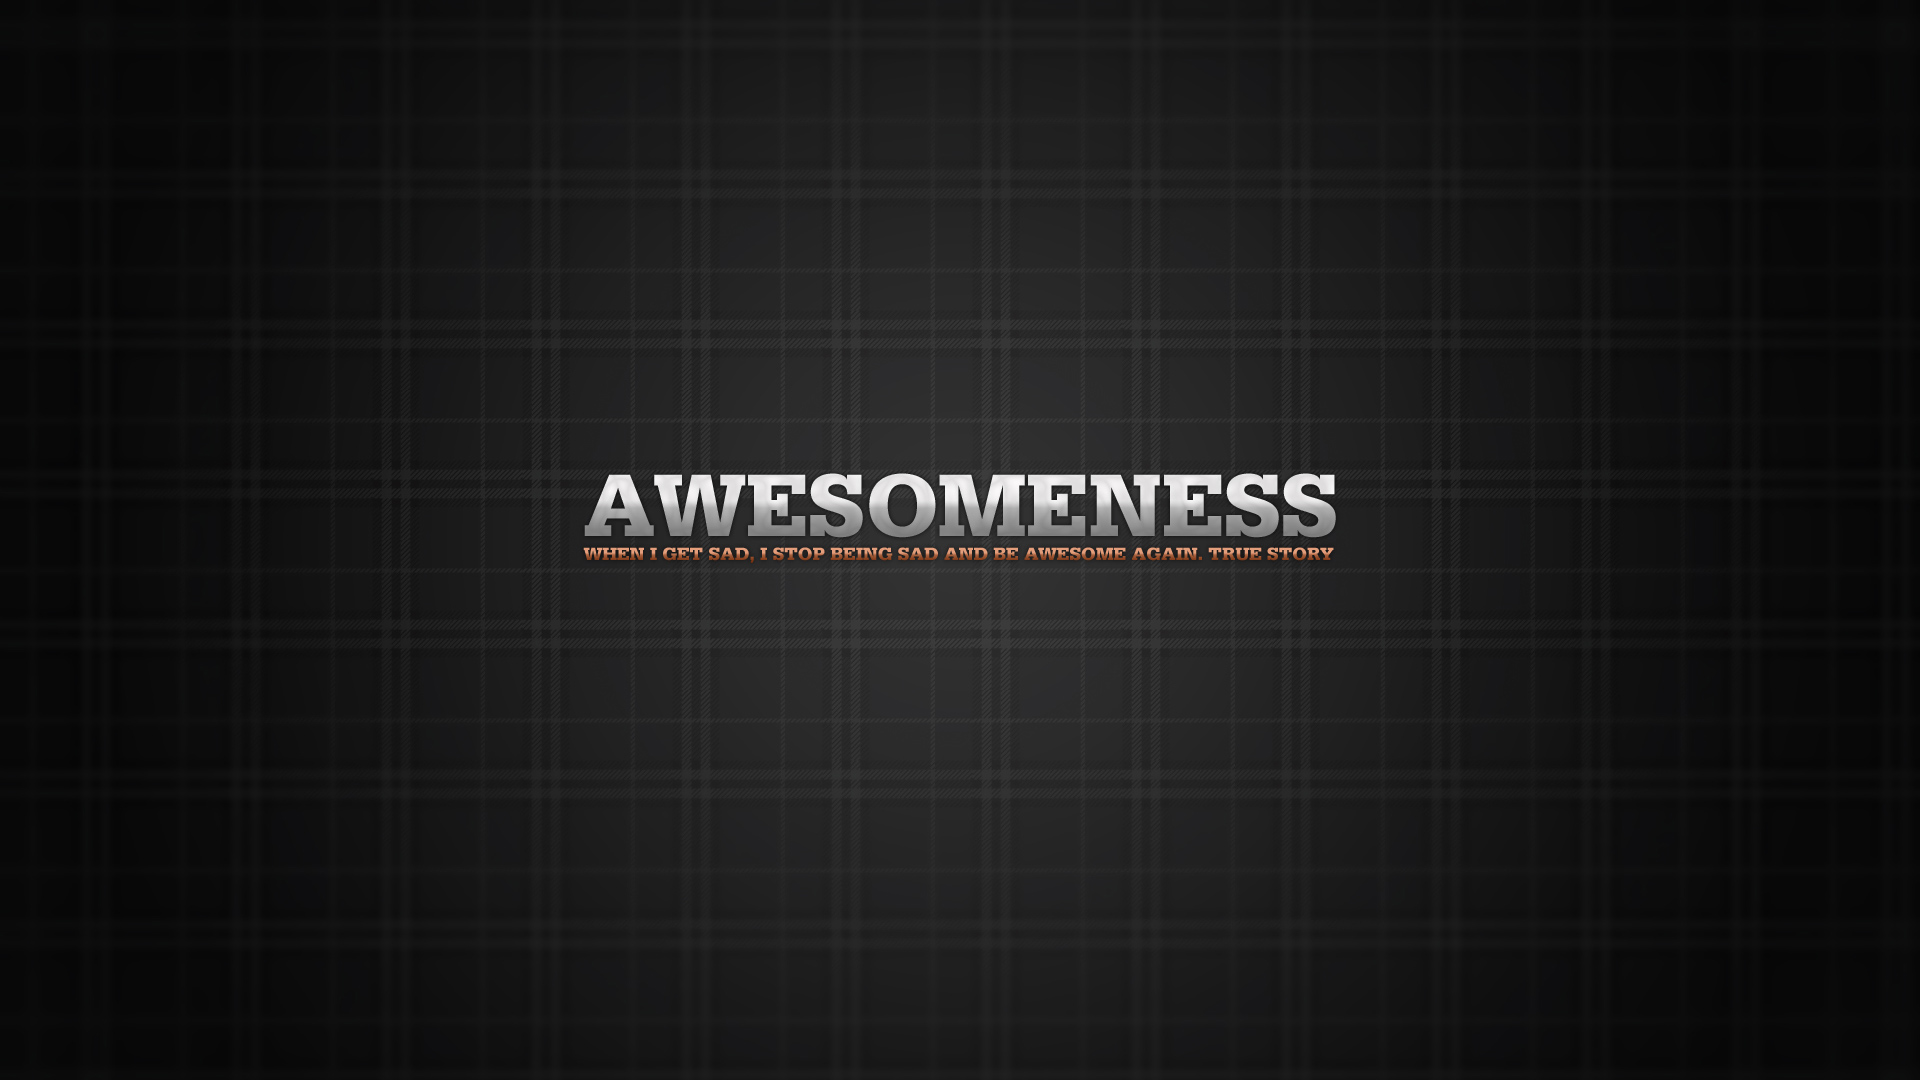 Quote Wallpapers 1080p Full HD Wallpapers download 1080p desktop 1920x1080